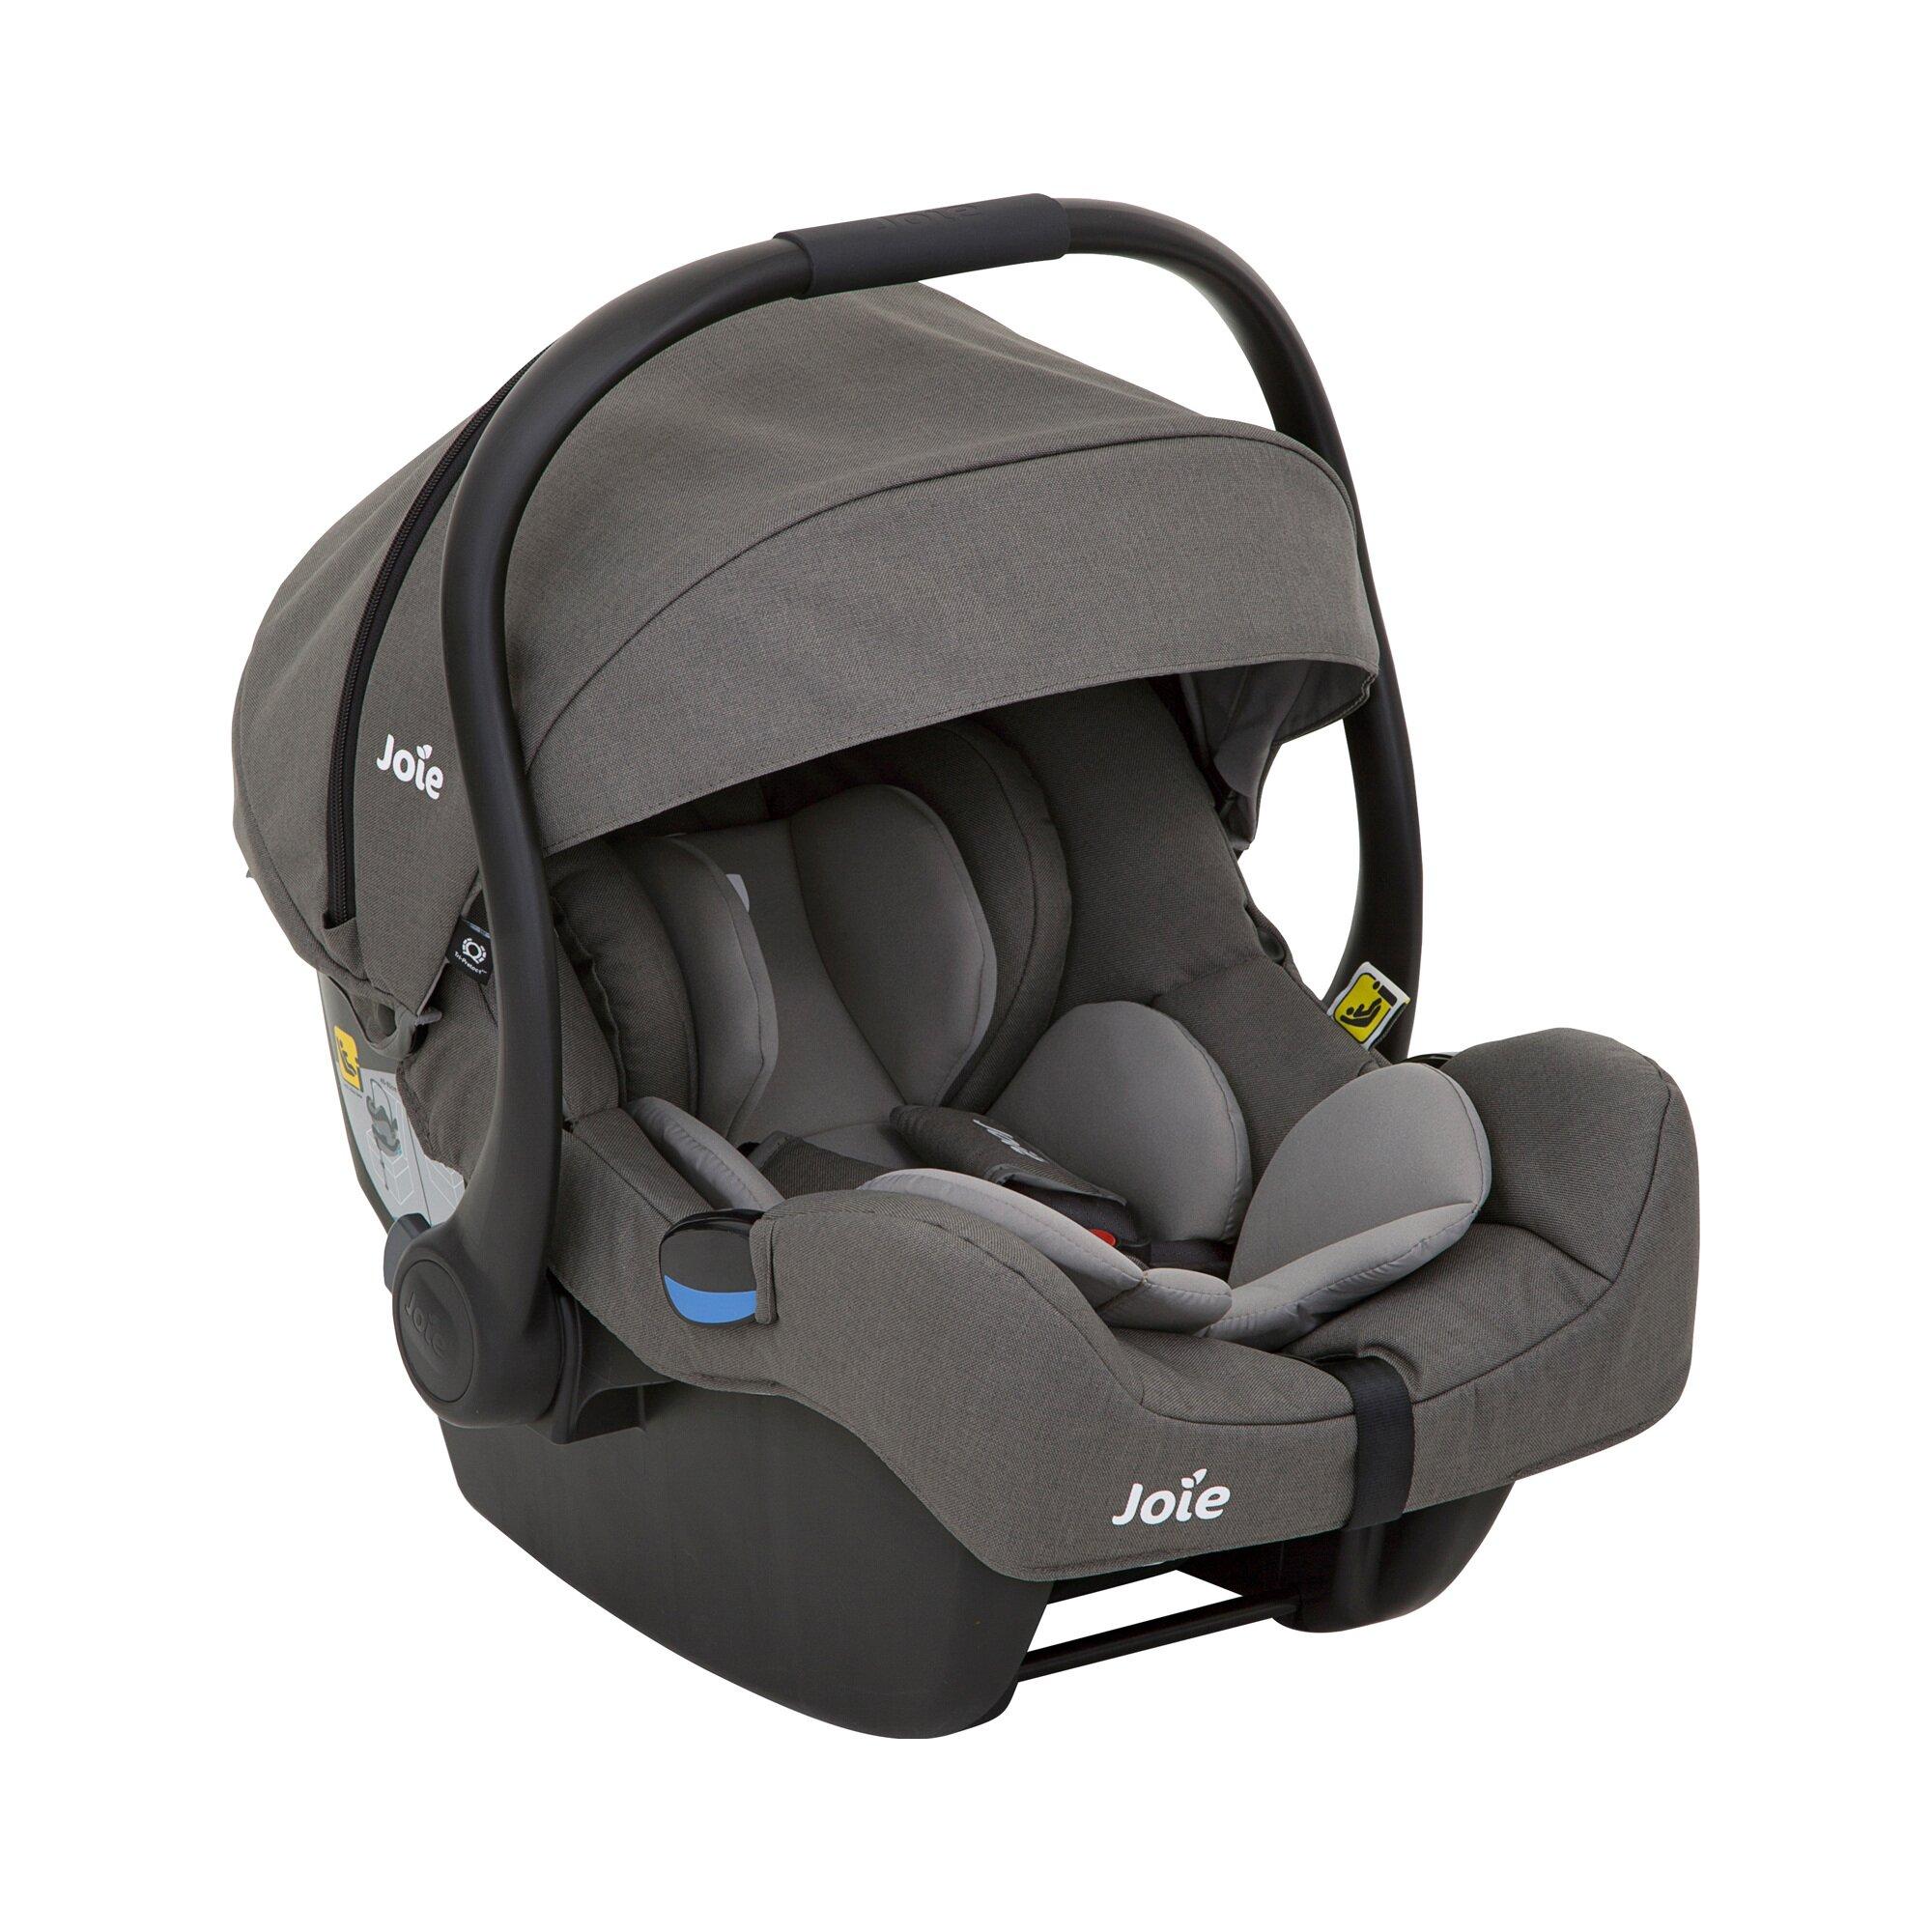 joie-i-gemm-i-size-babyschale-design-2018-grau